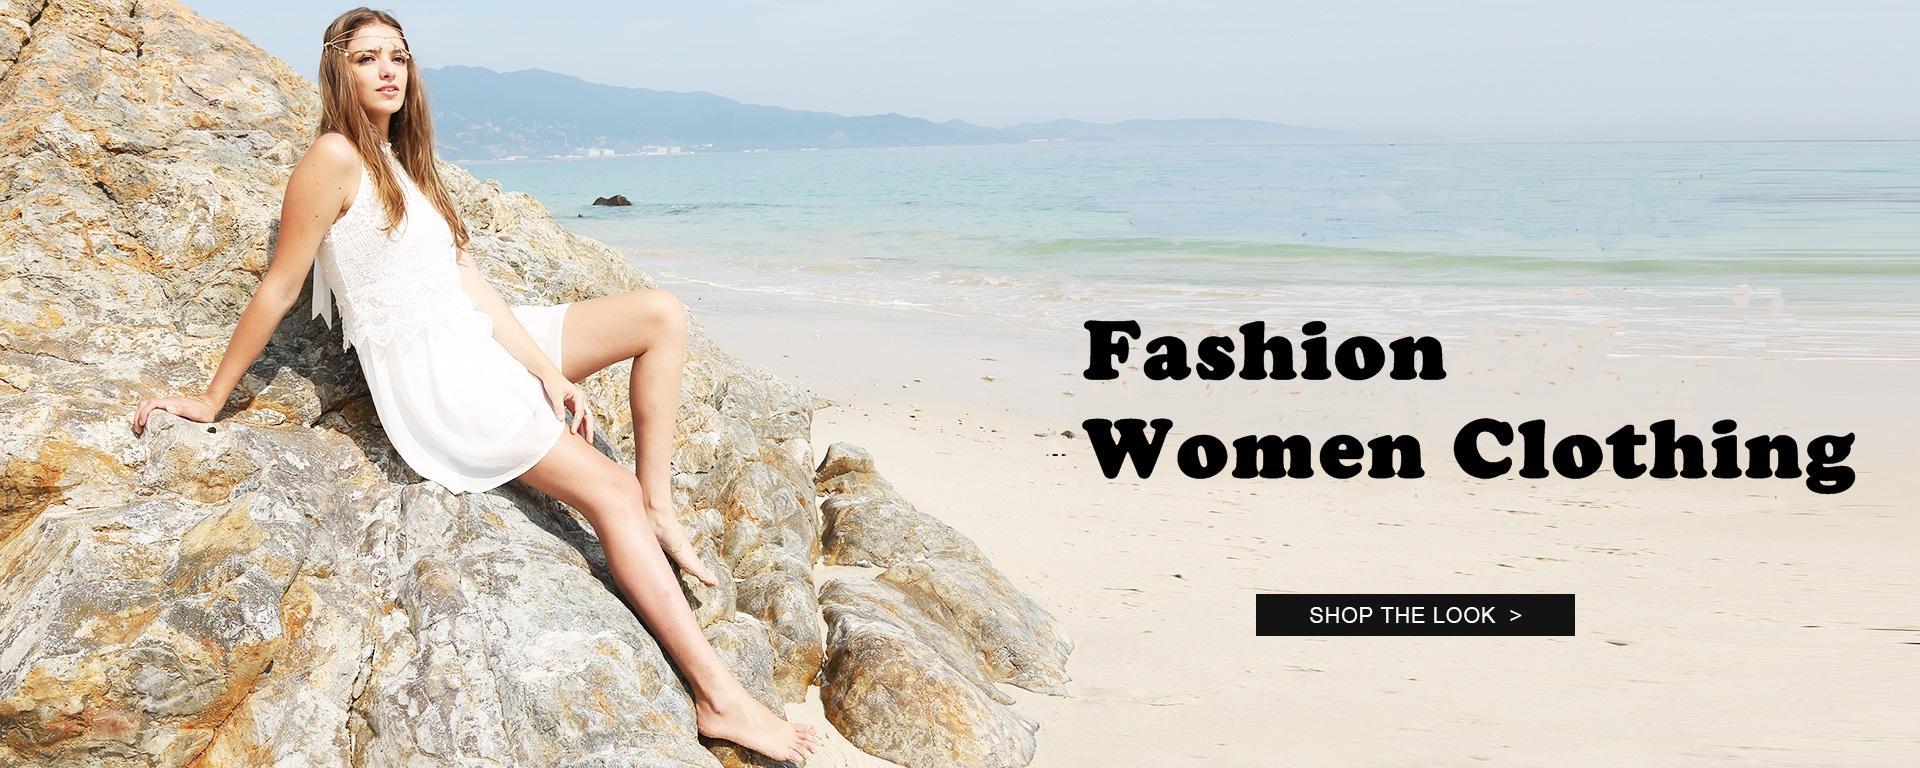 Dongguan Metro Clothing Factory - Dress,Hoody